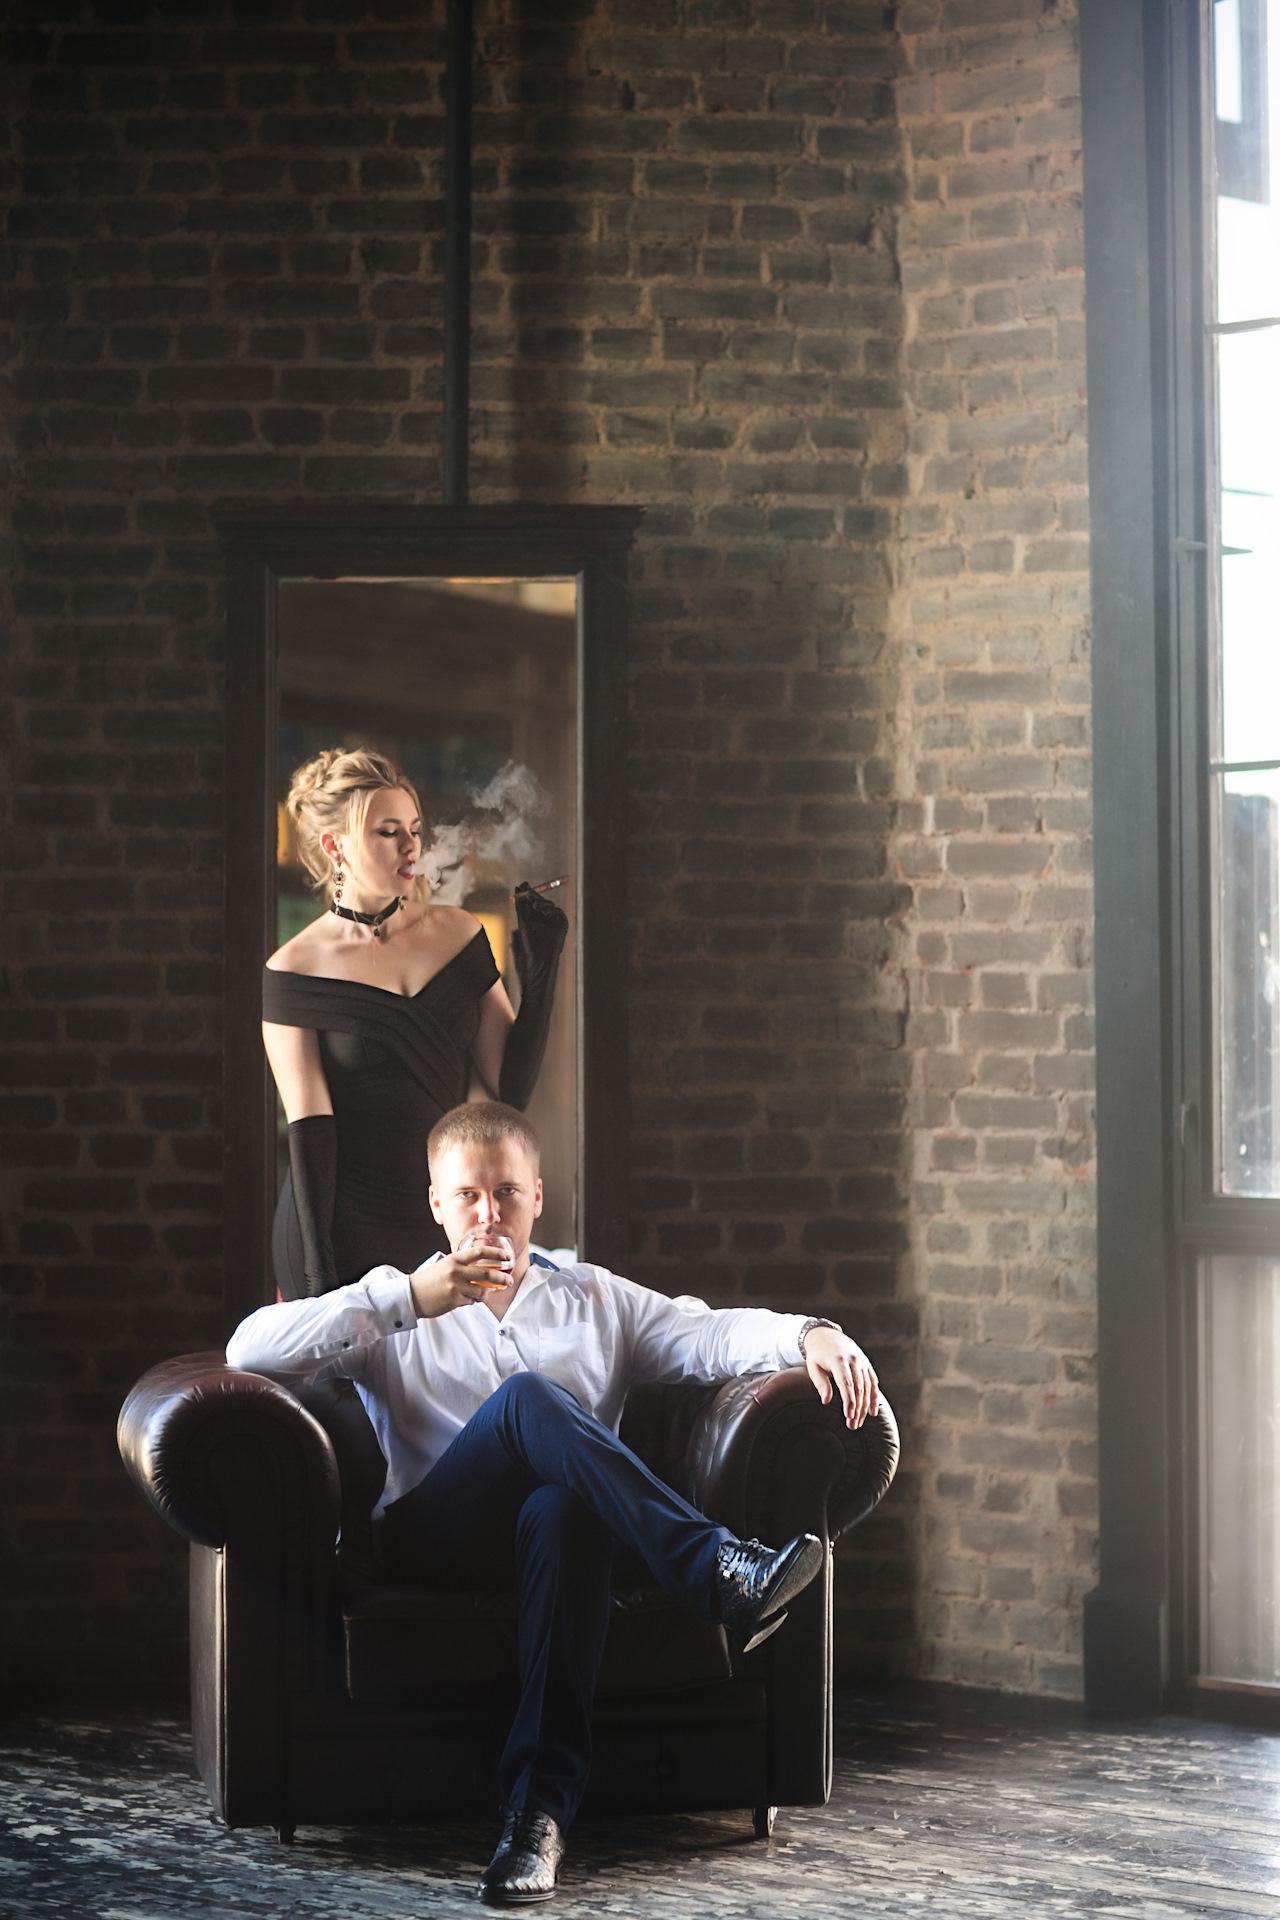 фотосессии в стиле мистер и миссис смит снижена связи переездом